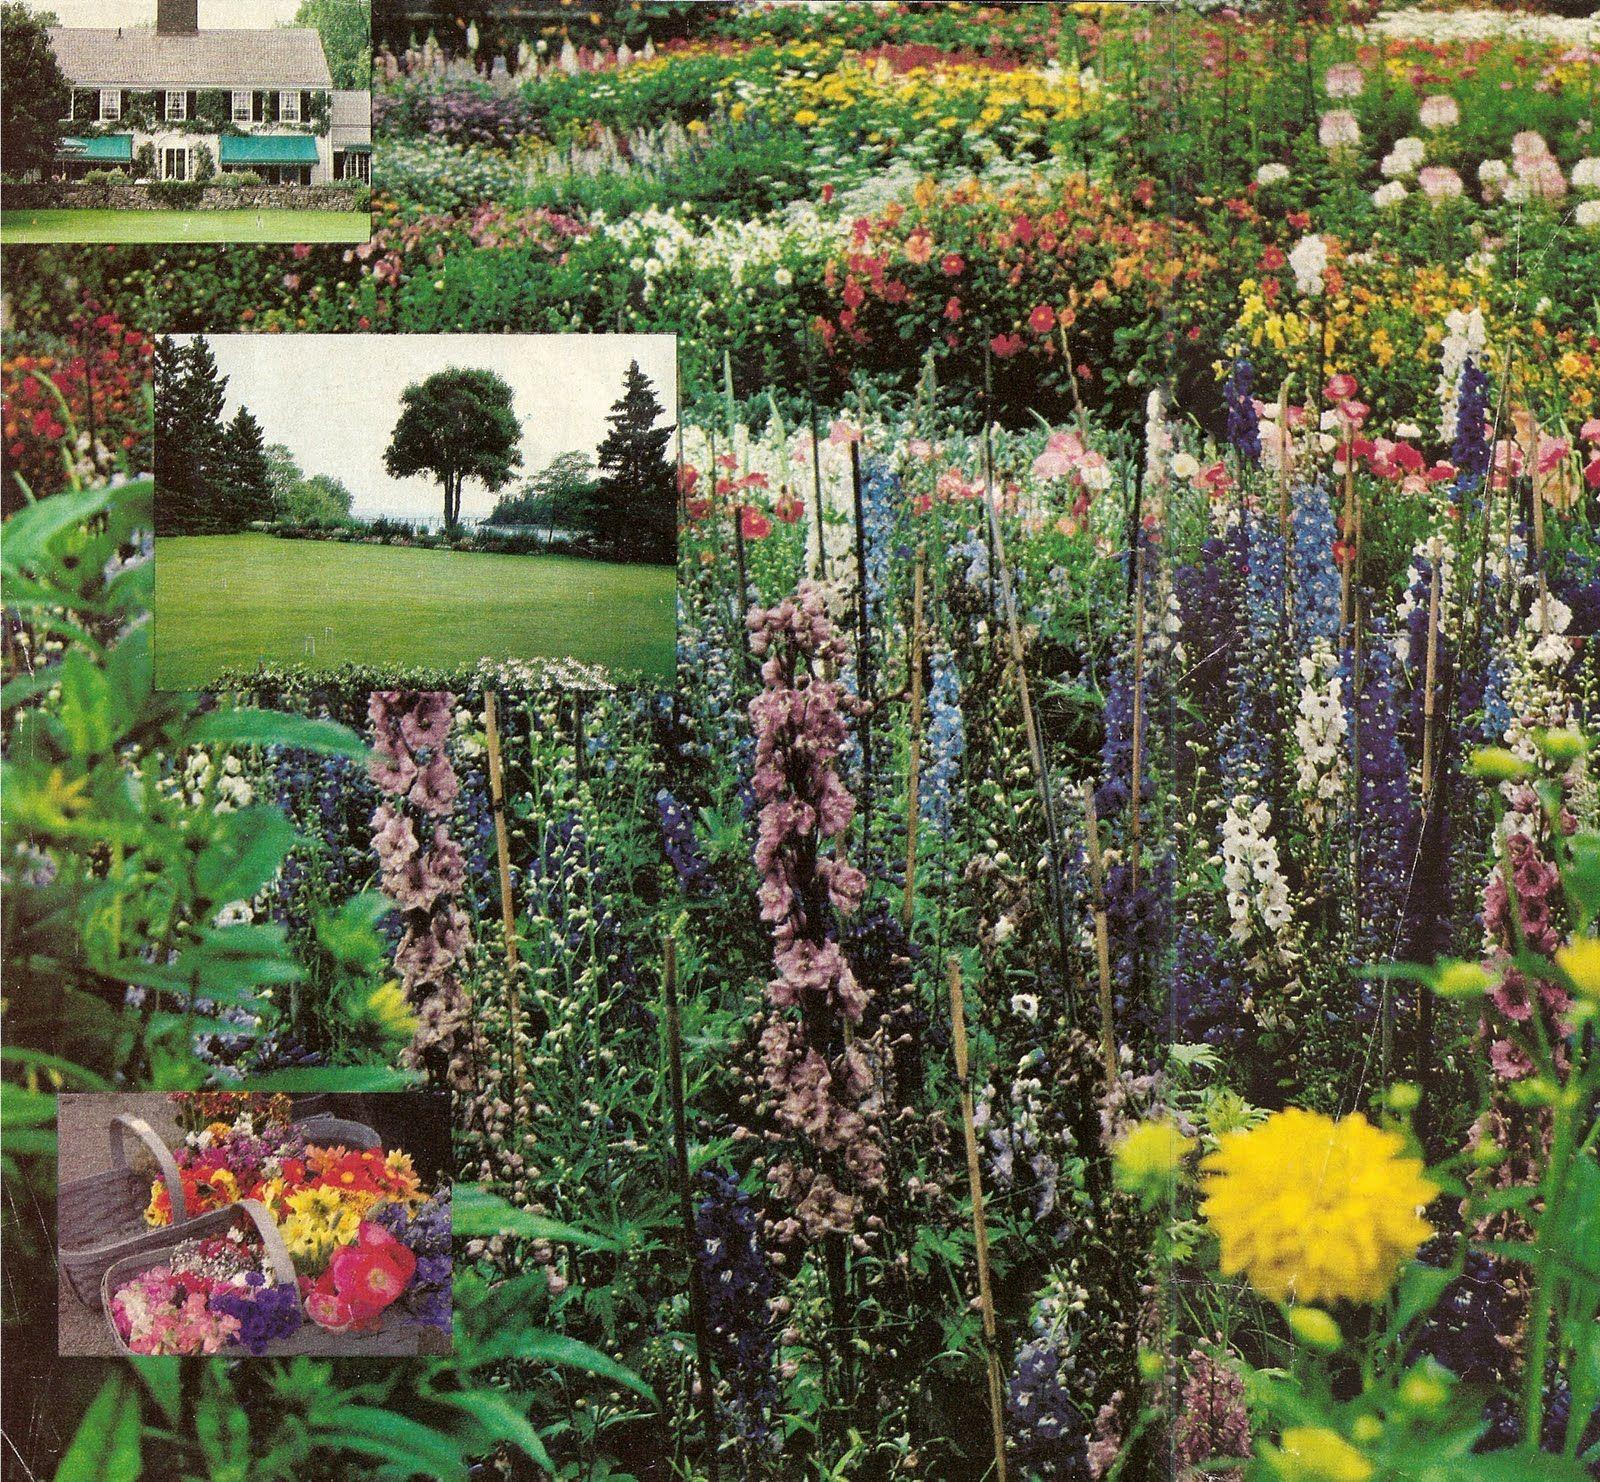 Brooke Astor S Garden At Cove End In Maine Garden Design By Beatrix Farrand Vintage Gardening Garden History Garden Design